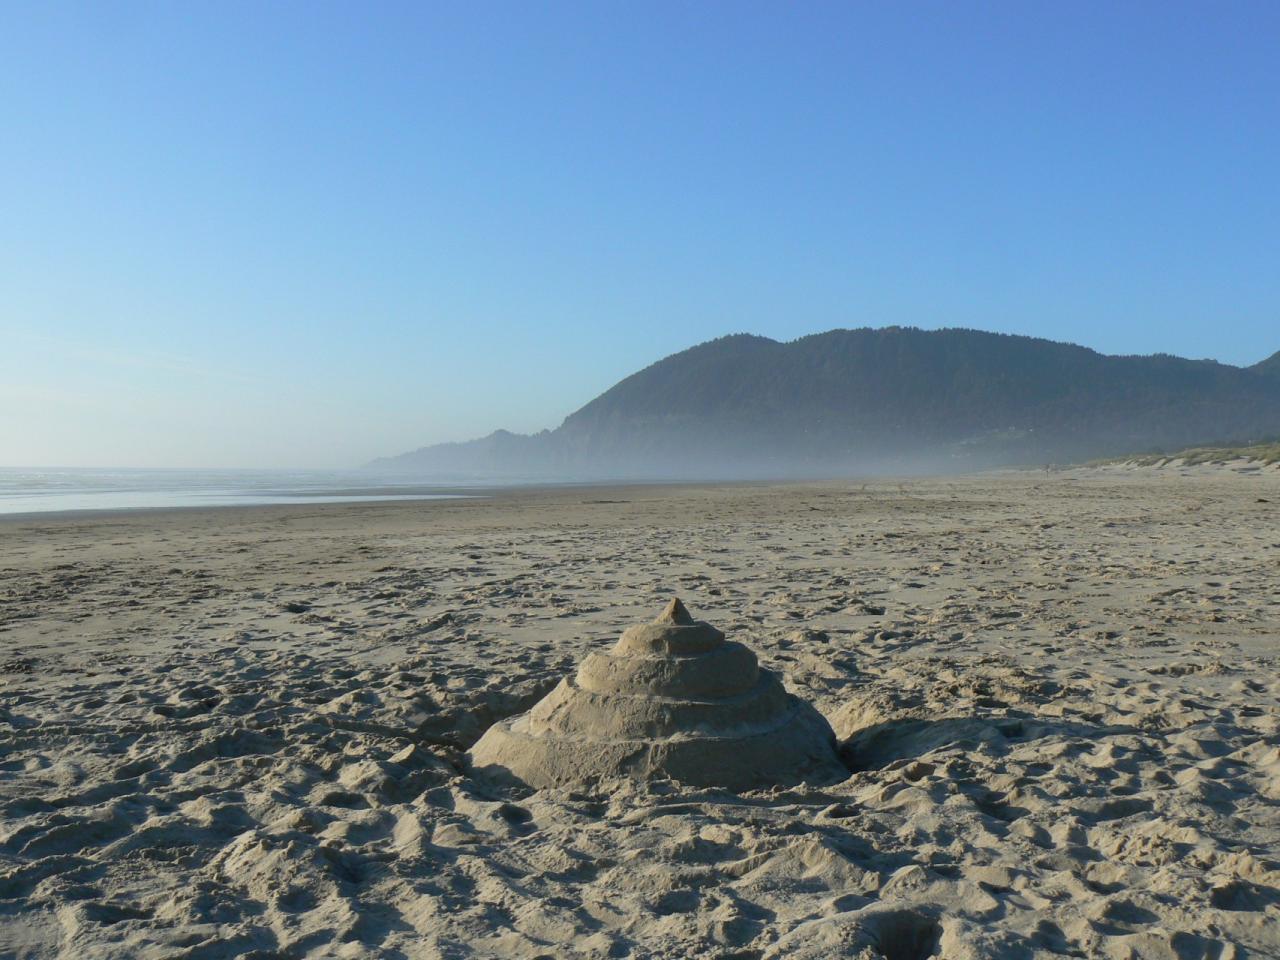 Manzanita Beach looking toward NeaKahNie Mountain and Cape Falcon